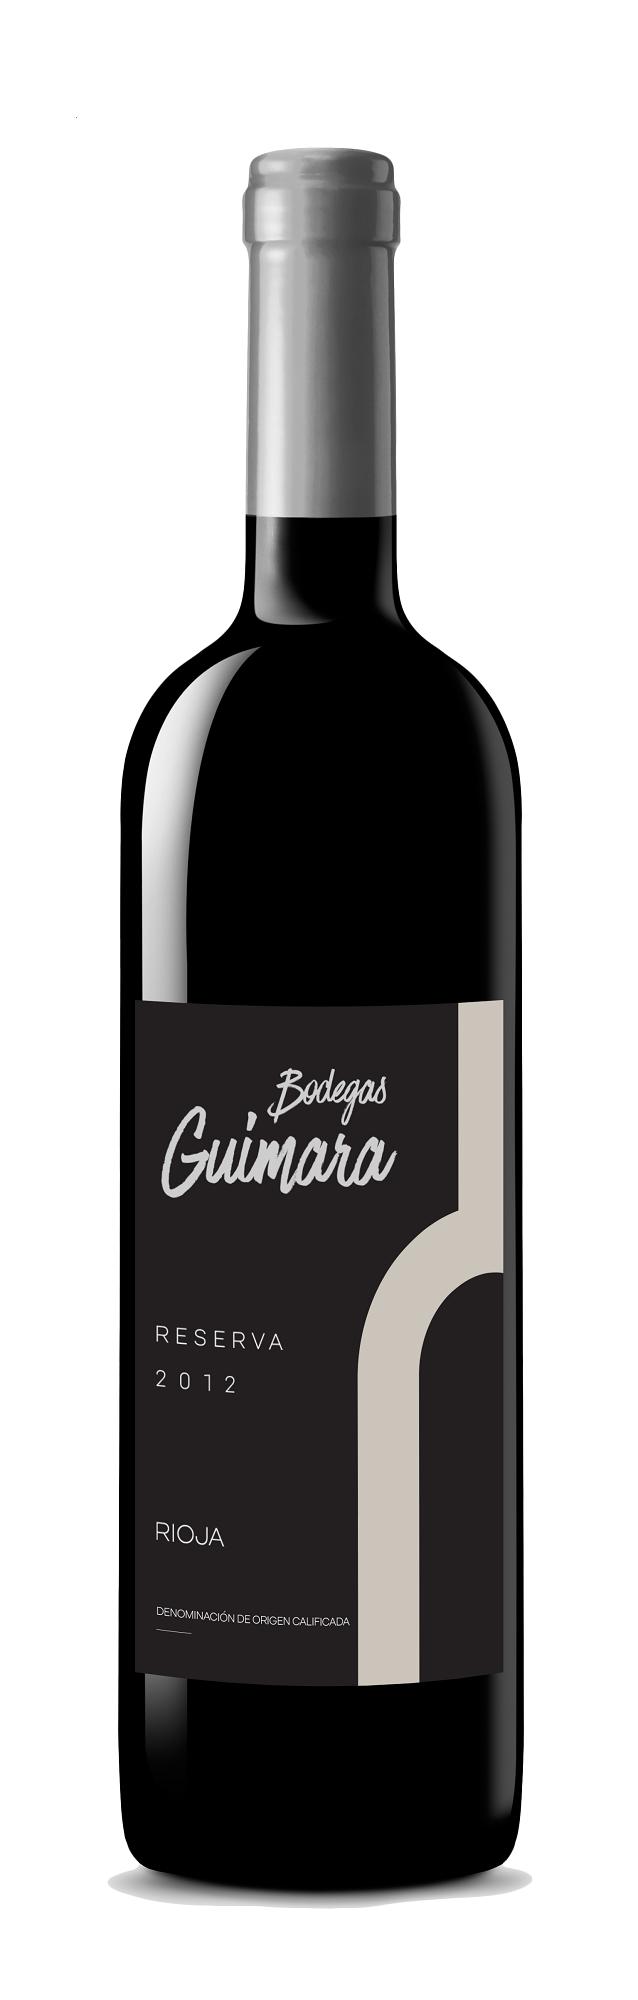 Bodegas Guimara